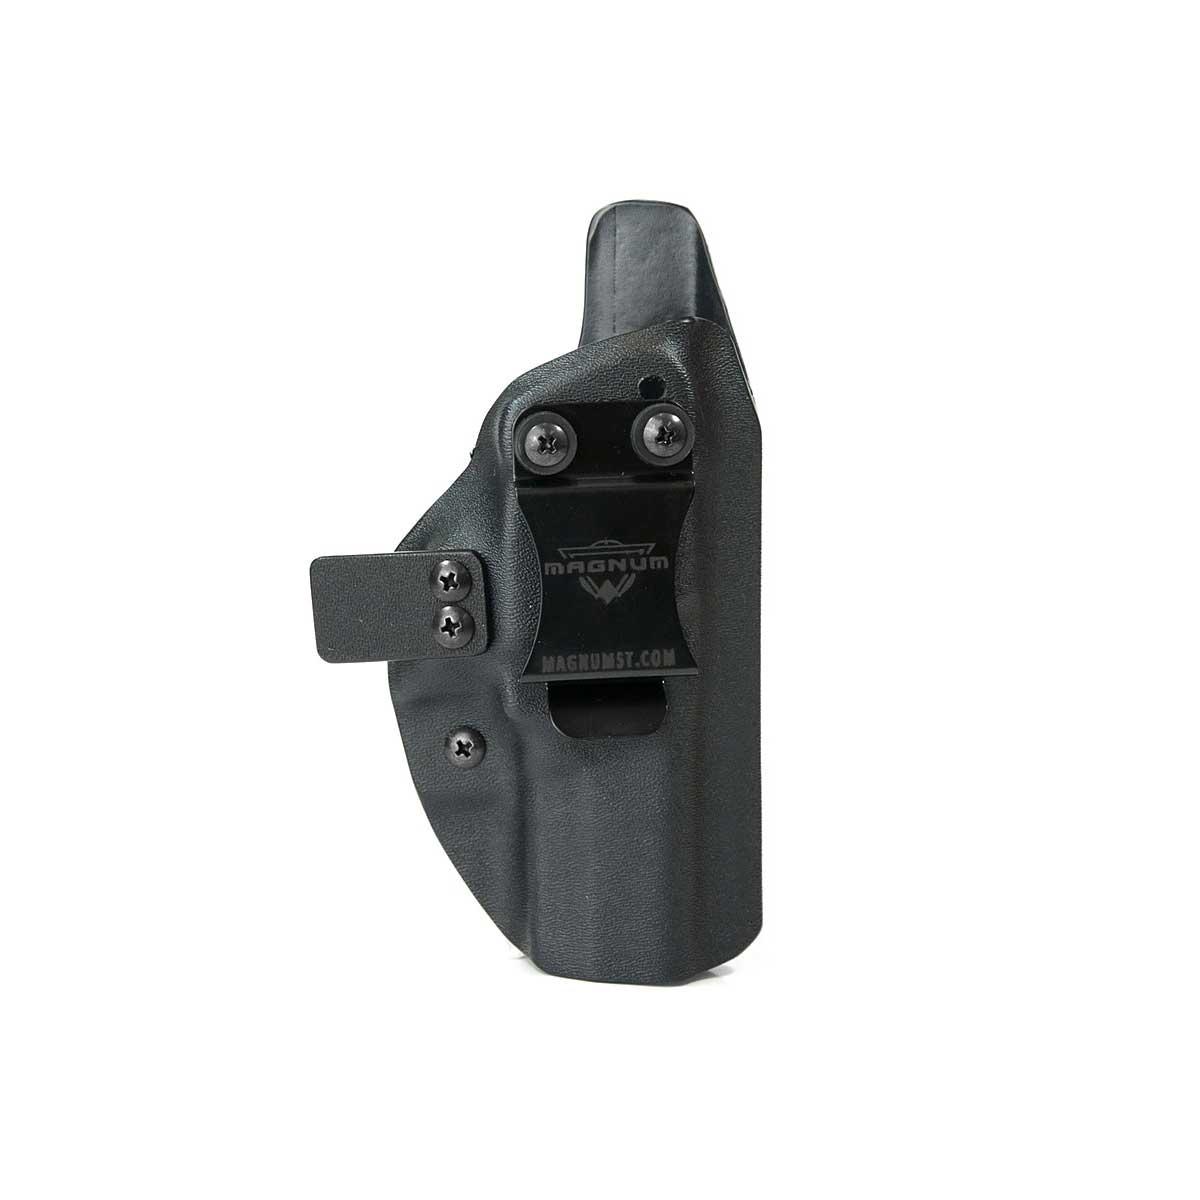 Coldre Slim Magnum Pist Glock G17/G22 Carbon Black - Destro